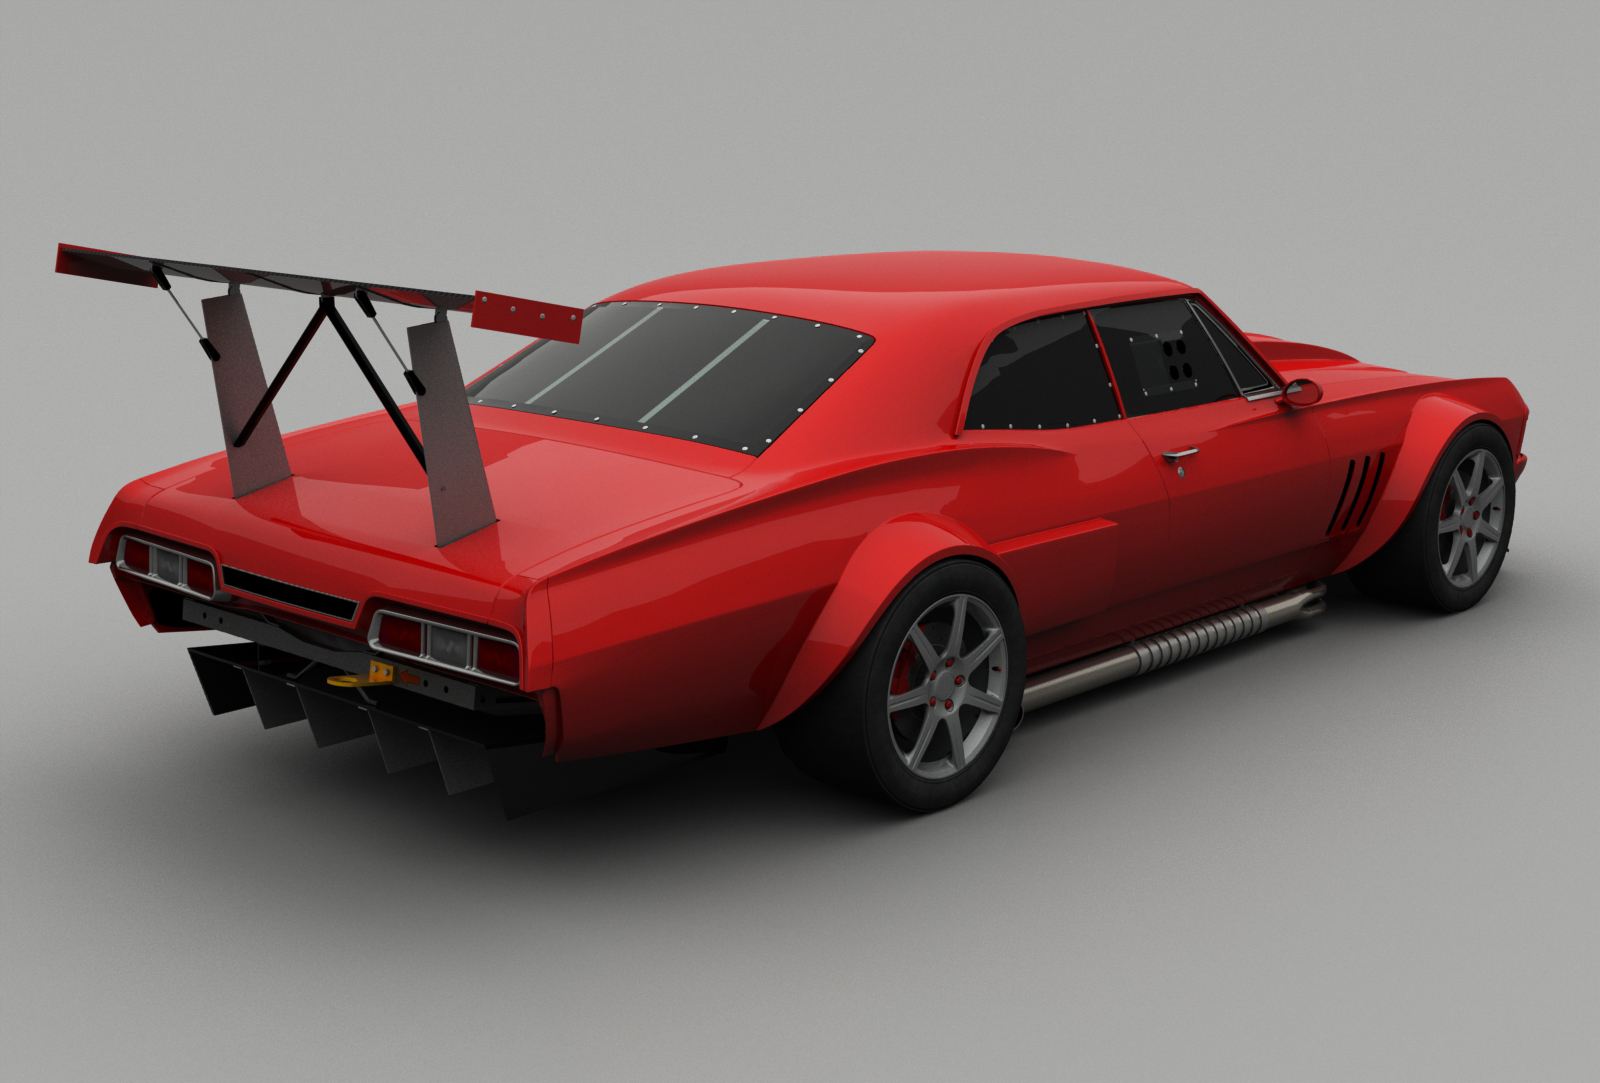 2013-03_The Crew_F.Beudin_Chevrolet Impala-1967-Racing_09